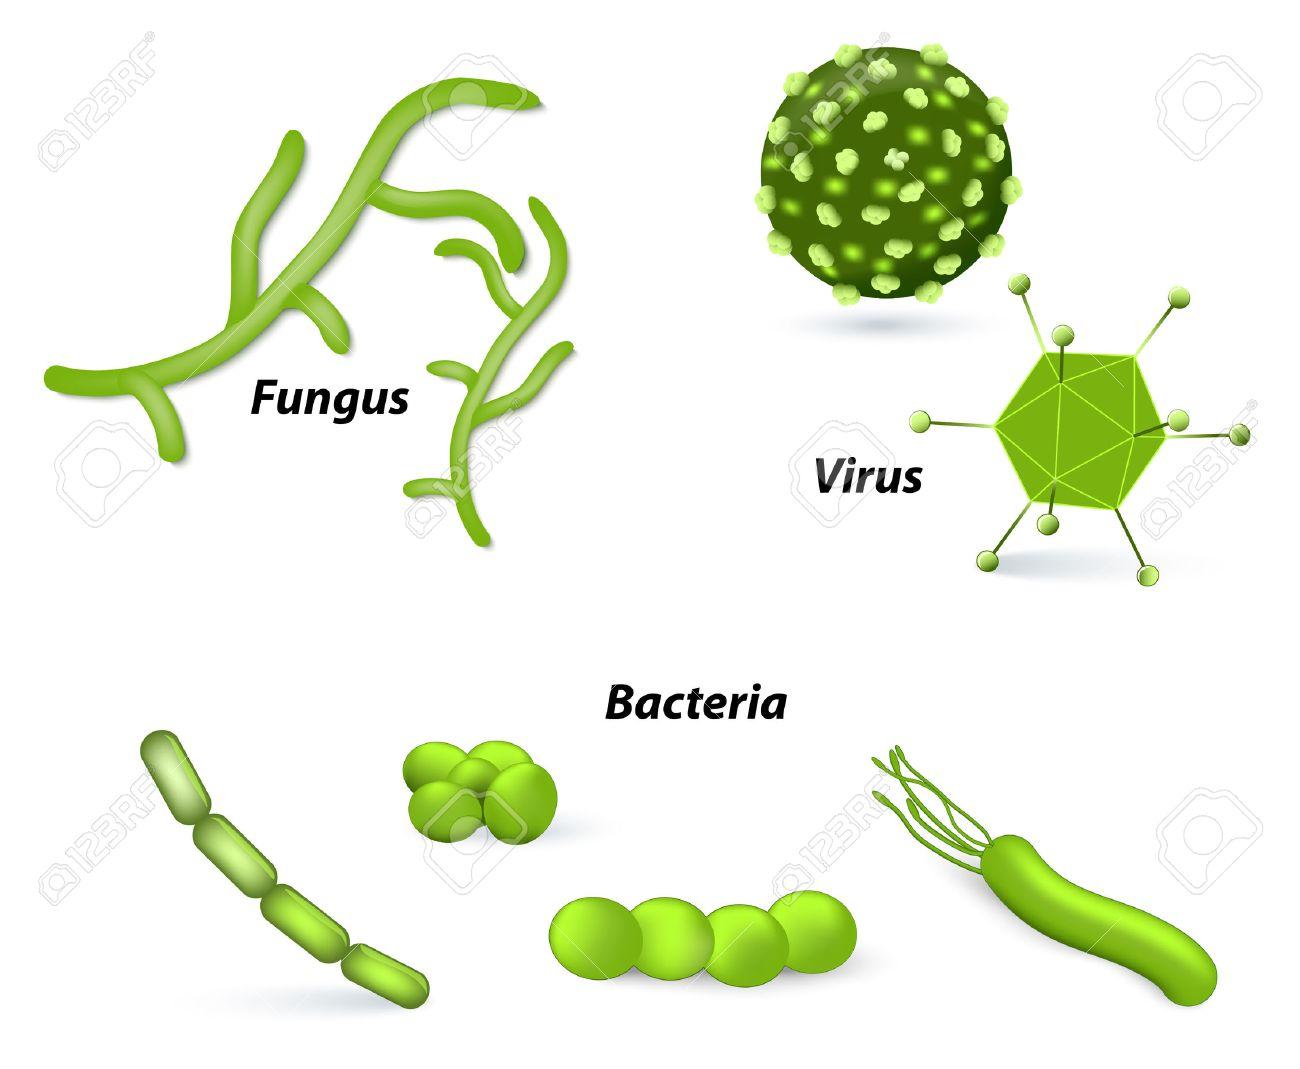 Bacteria clipart fungus bacteria. Fungi